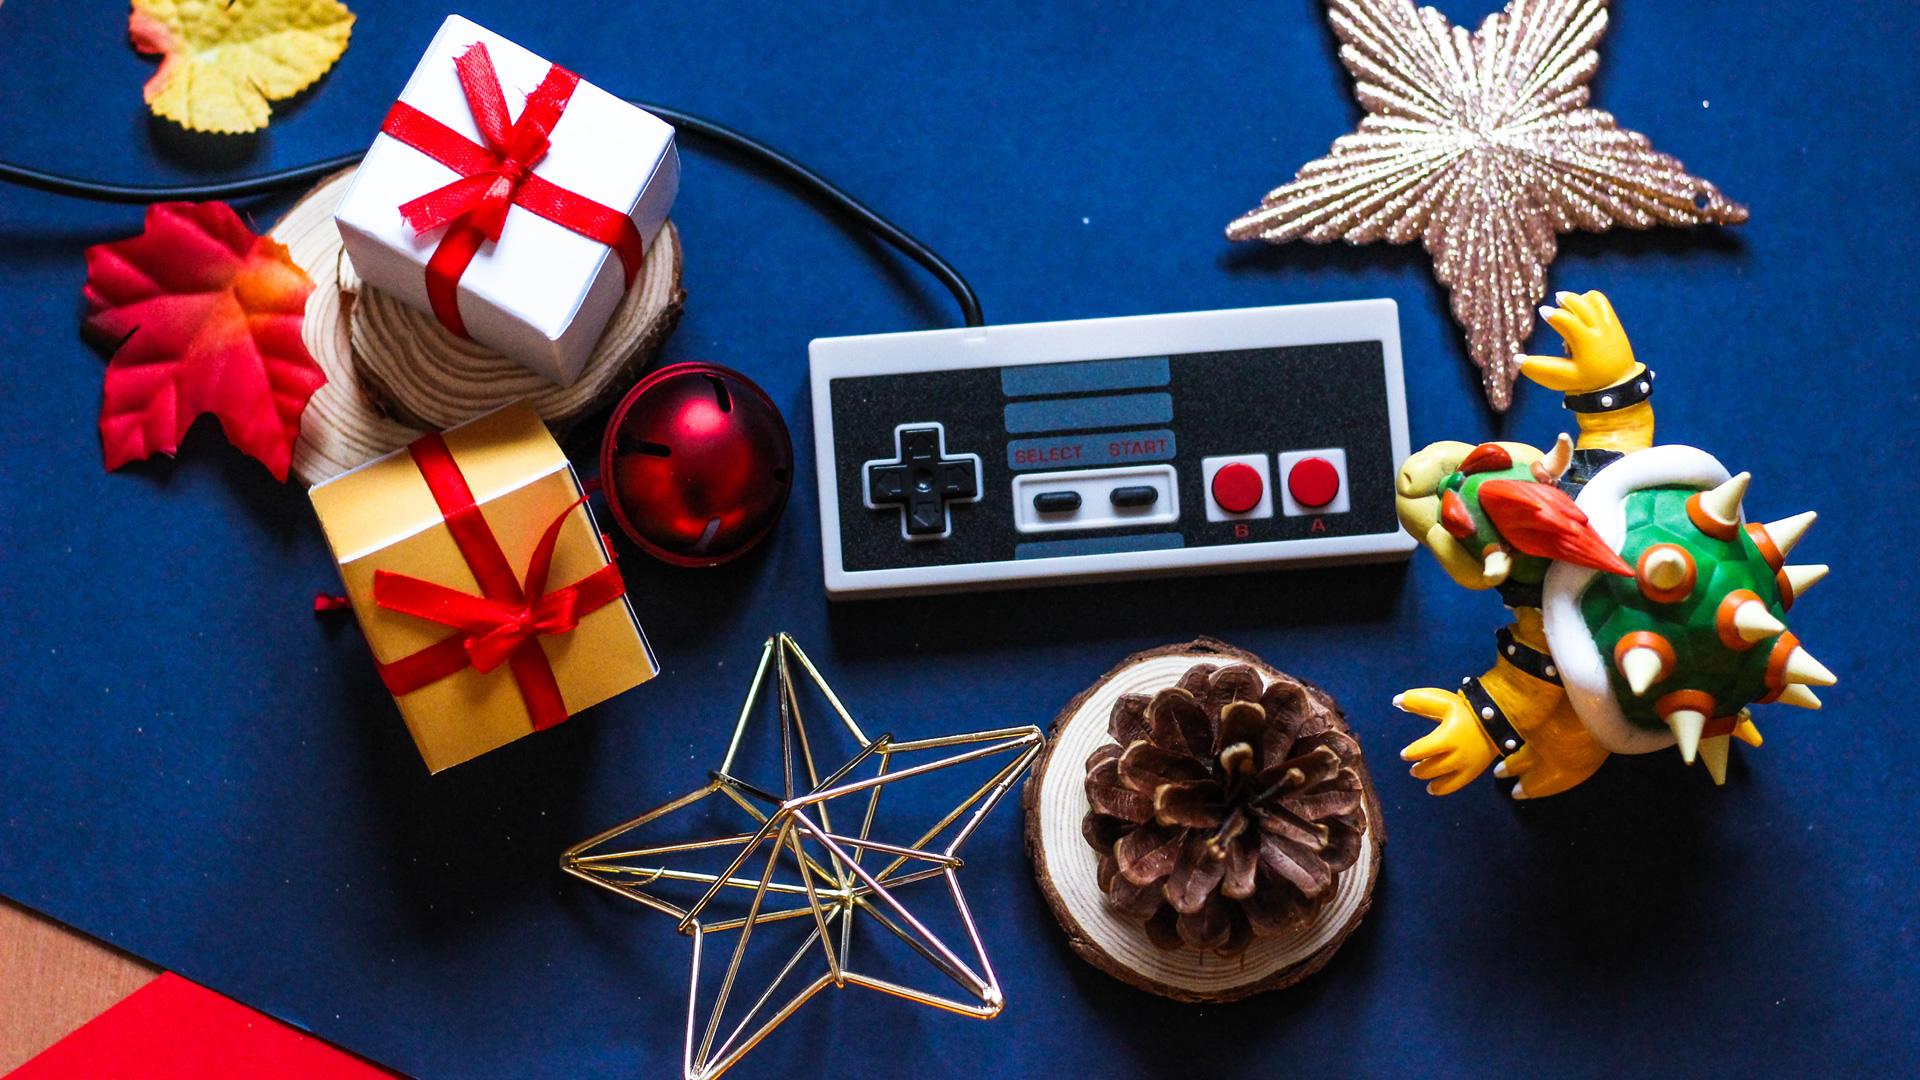 Unique Geeky Christmas Gifts 2018 – Zelda to Mario Kart